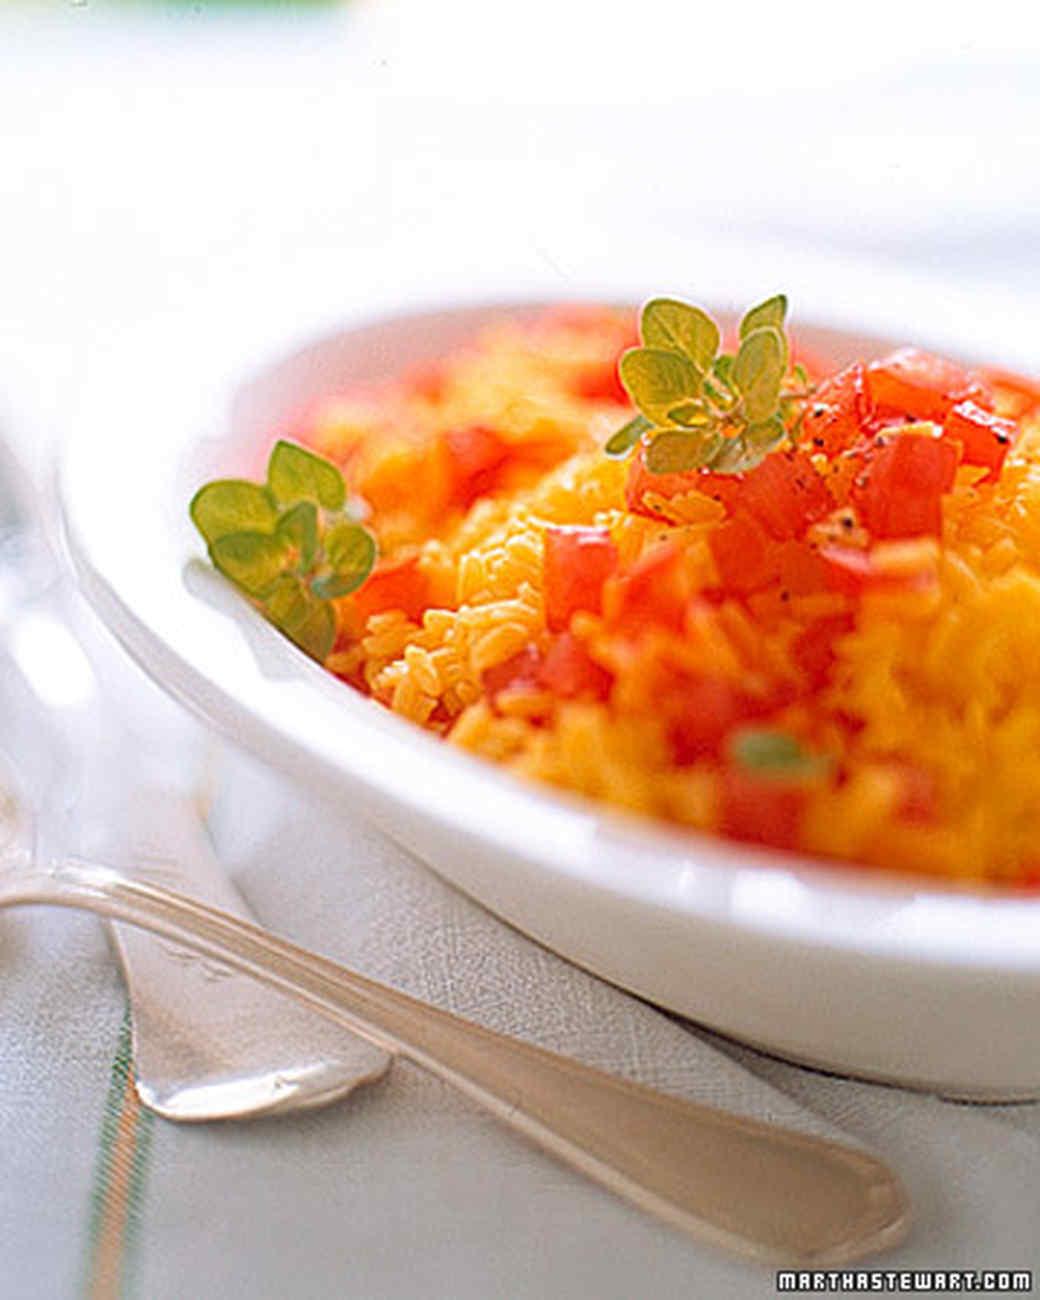 a98451_0301_rice.jpg